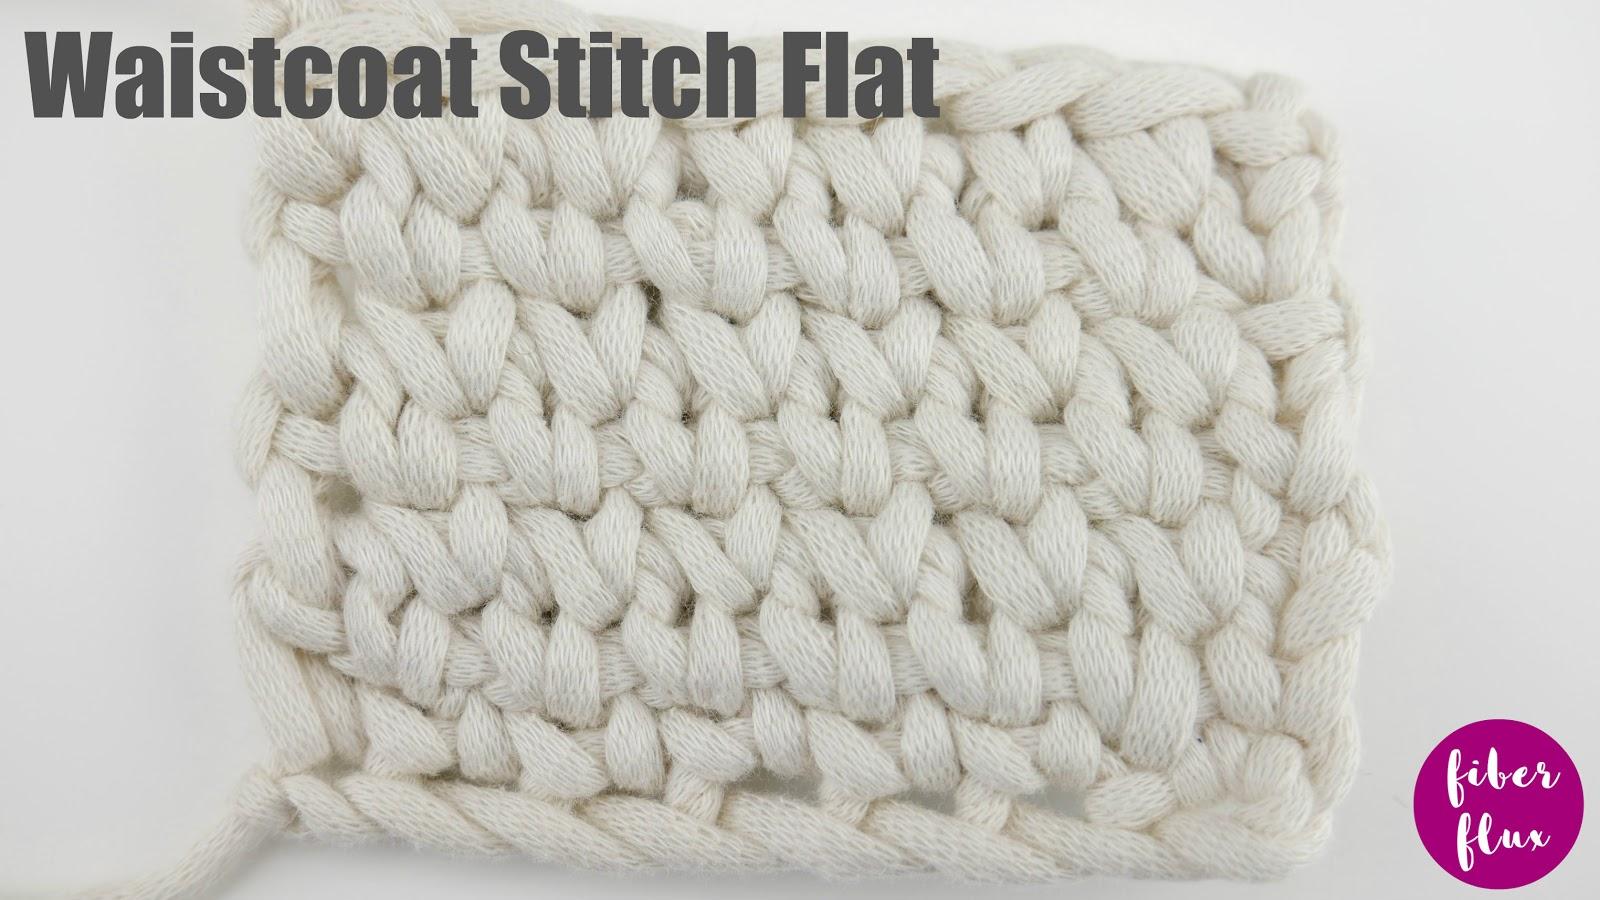 Fiber Flux The Waistcoat Stitch Crochet Knit Stitch Flat In The